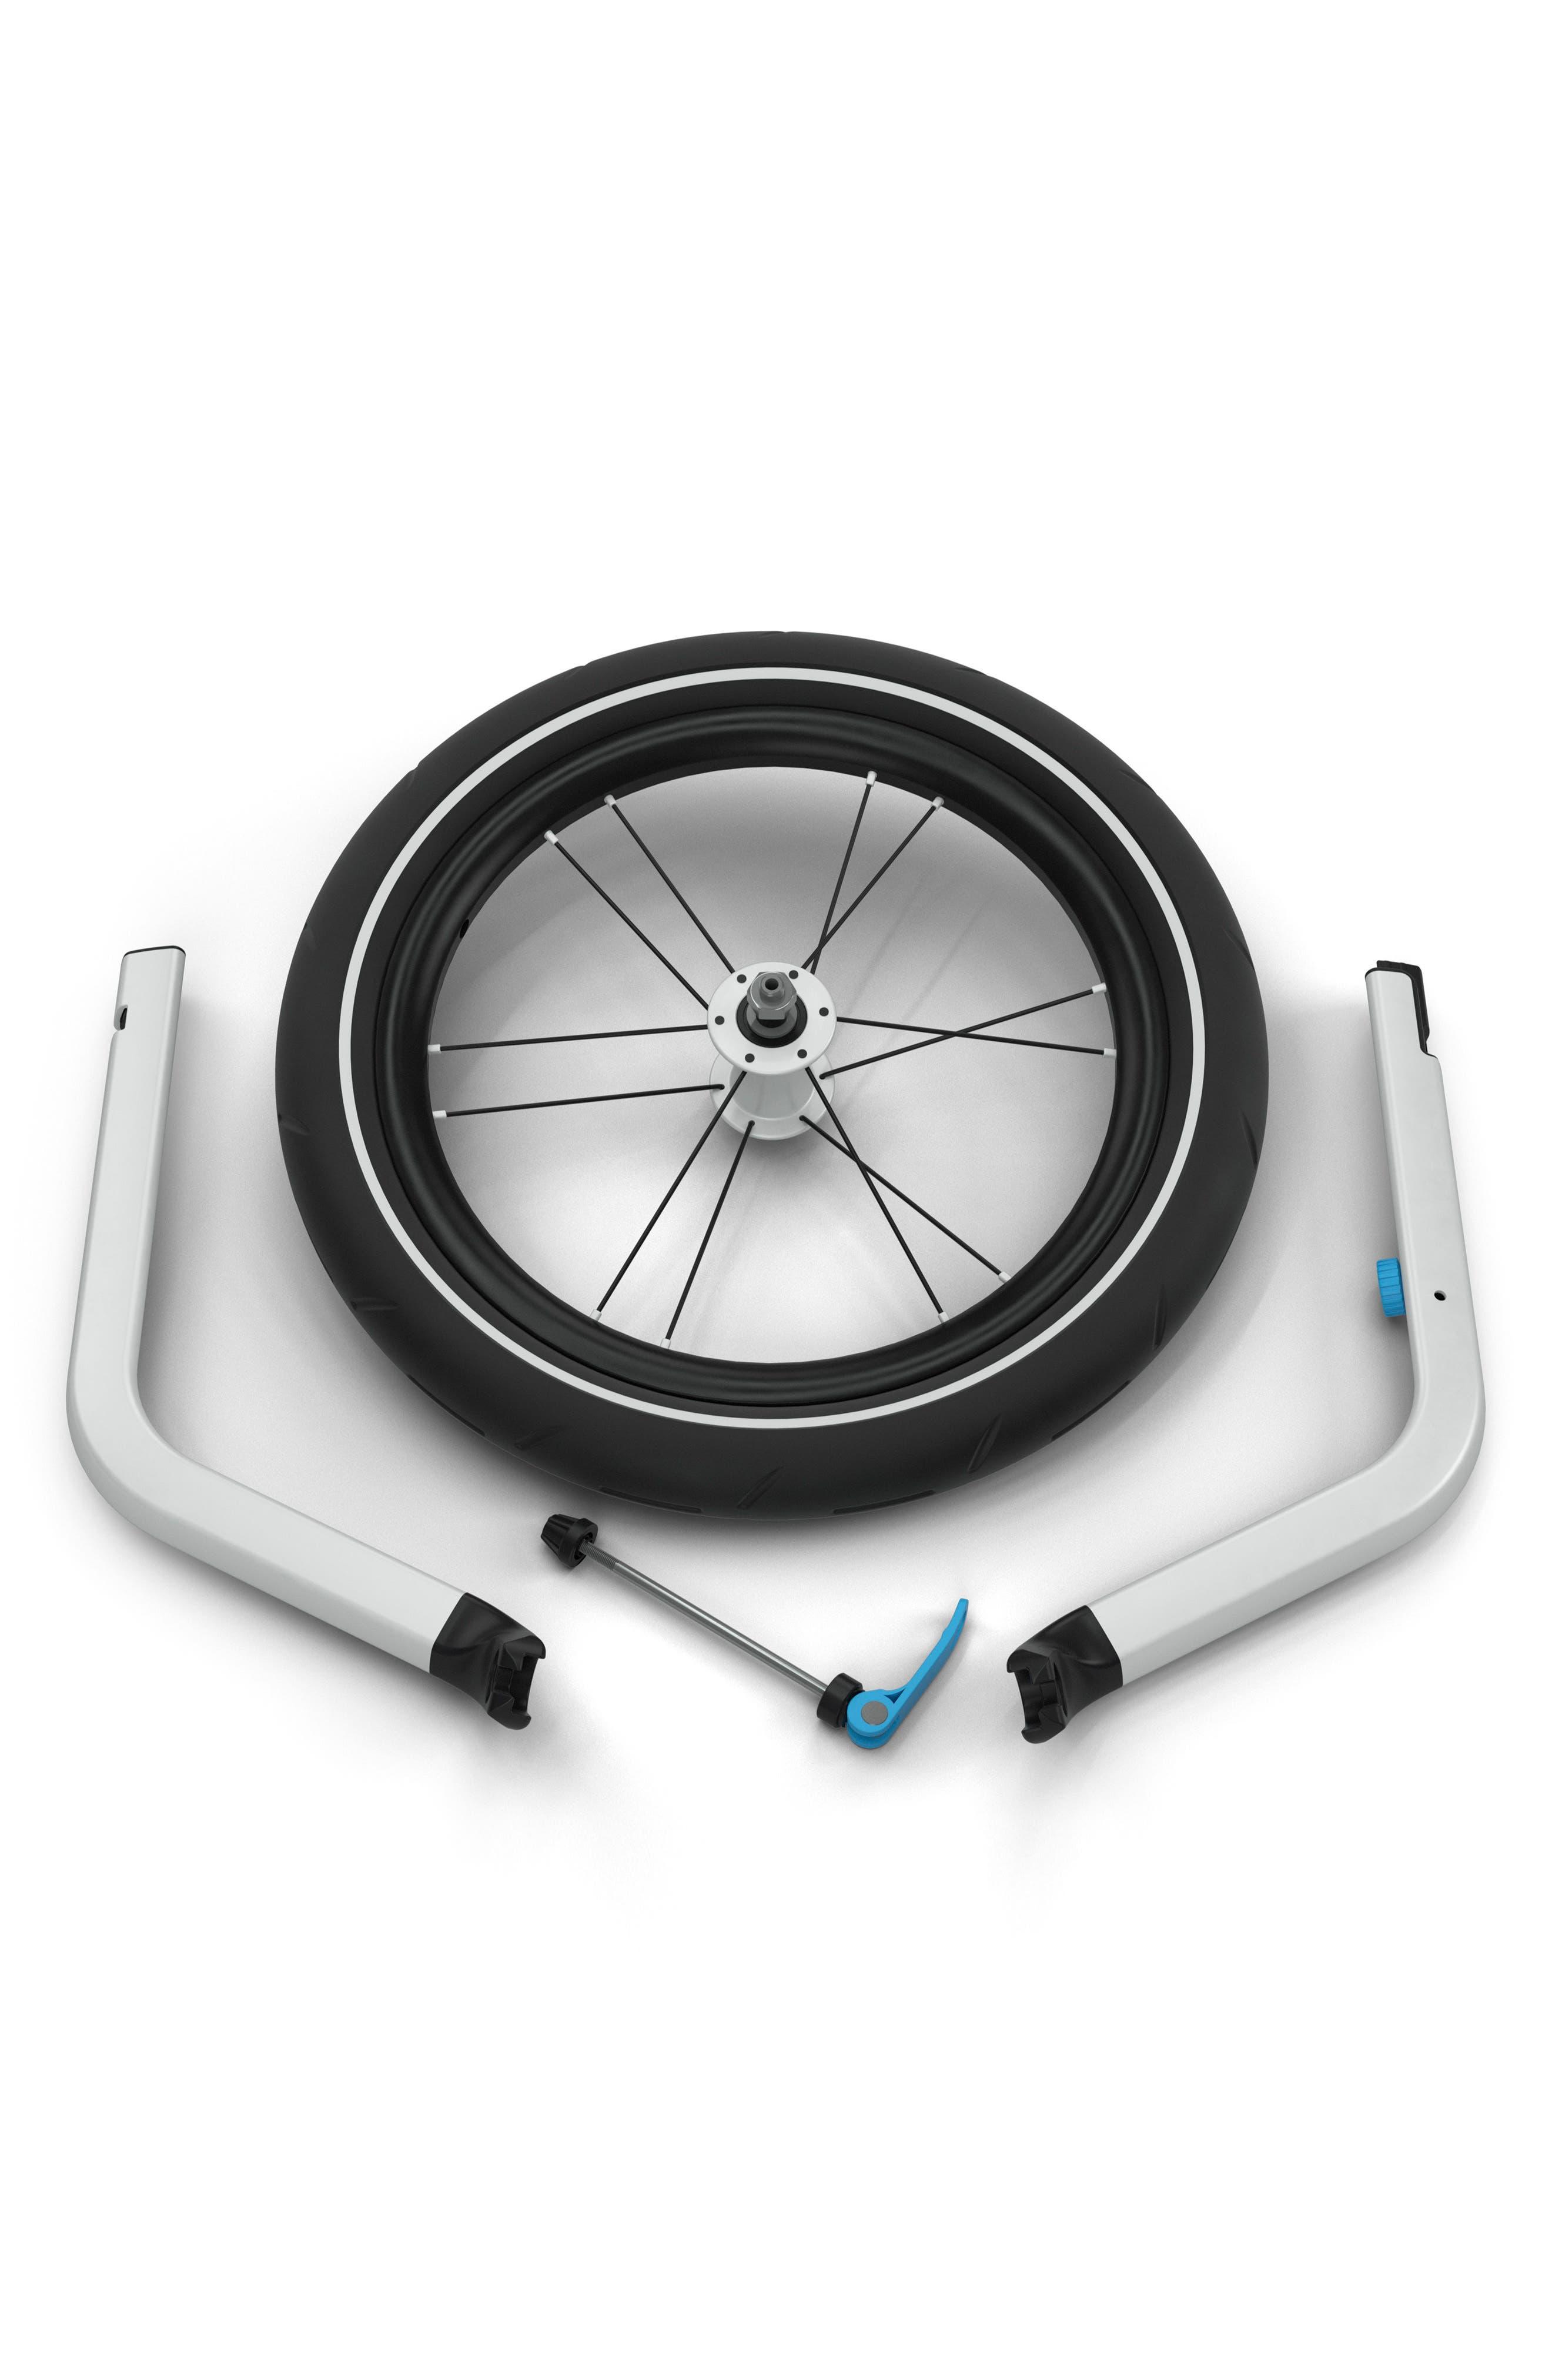 Jogger Conversion Kit for Thule Chariot Single Stroller,                             Alternate thumbnail 2, color,                             BLACK